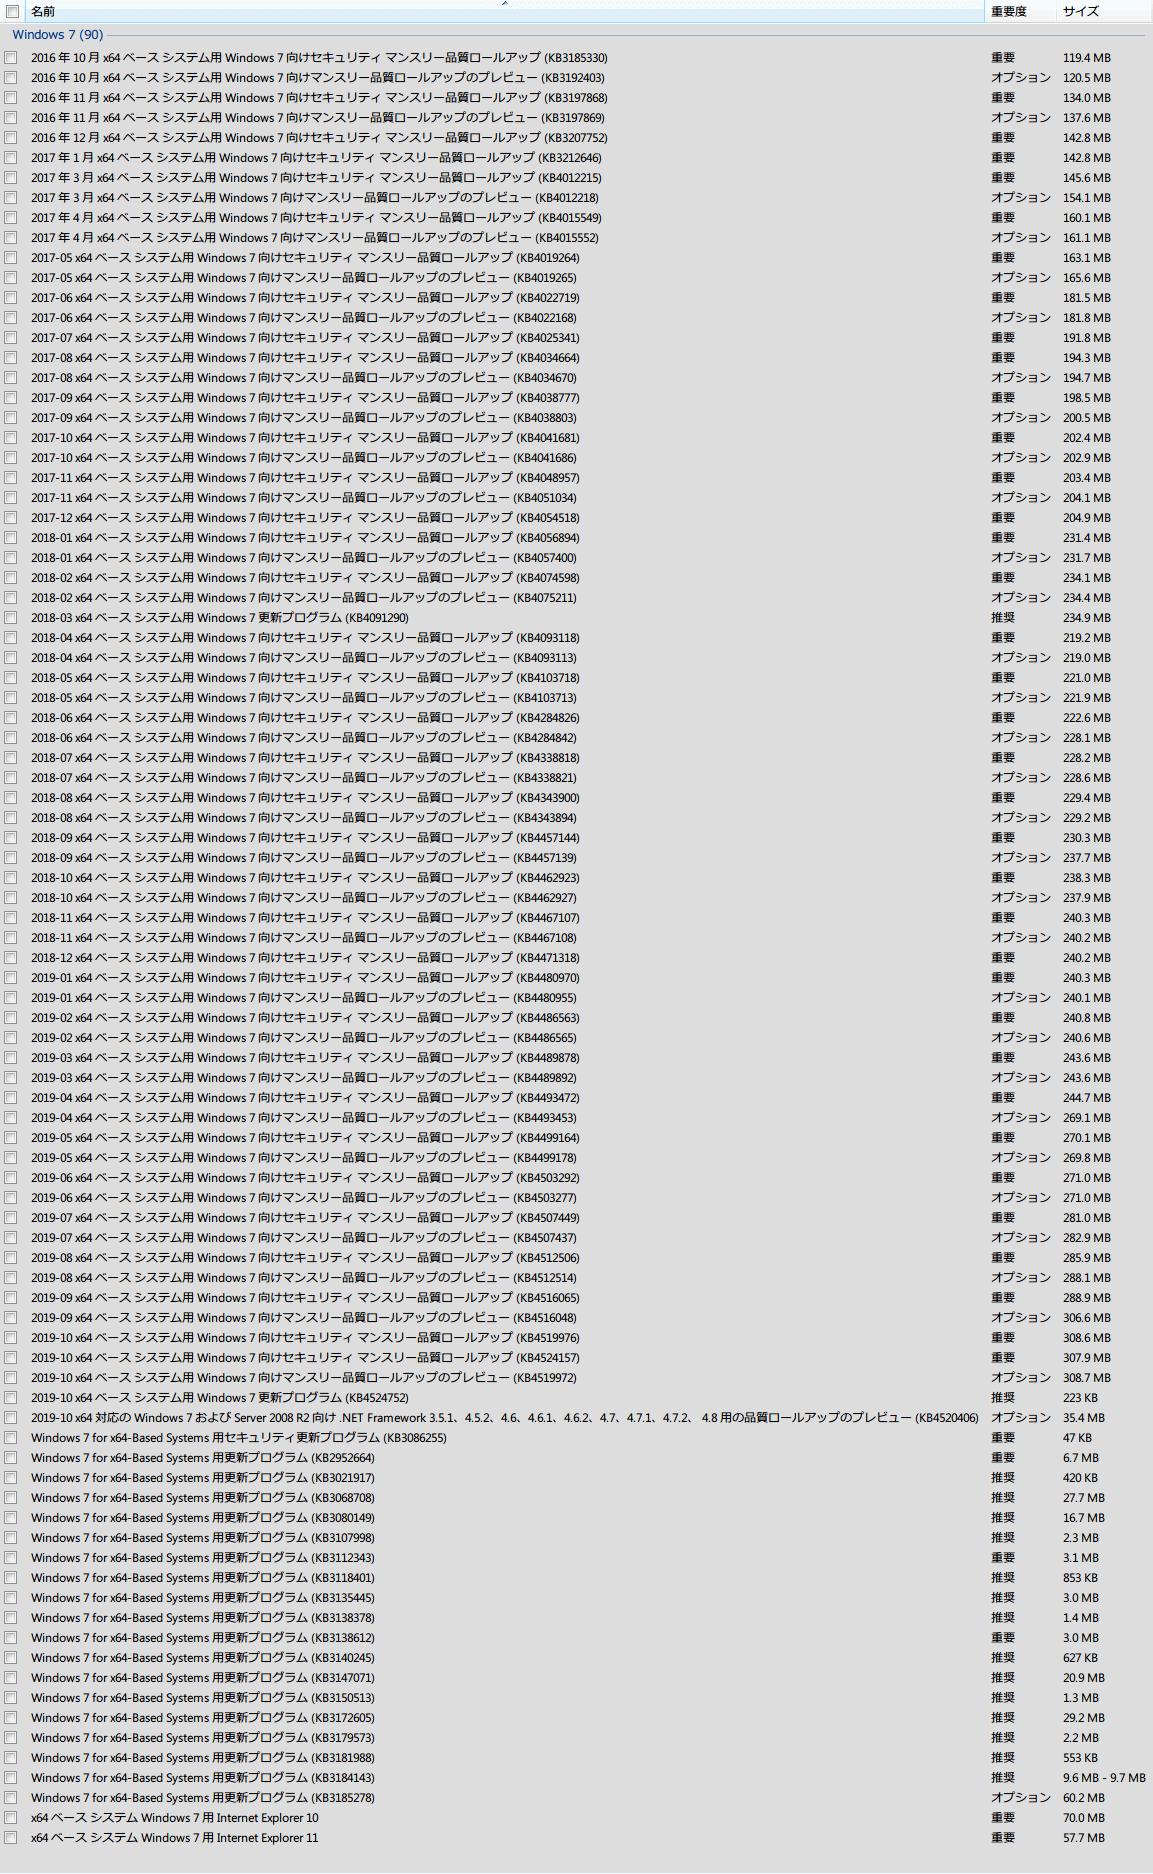 Windows 7 64bit Windows Update 2019年10月分まで非表示にした更新プログラムリスト